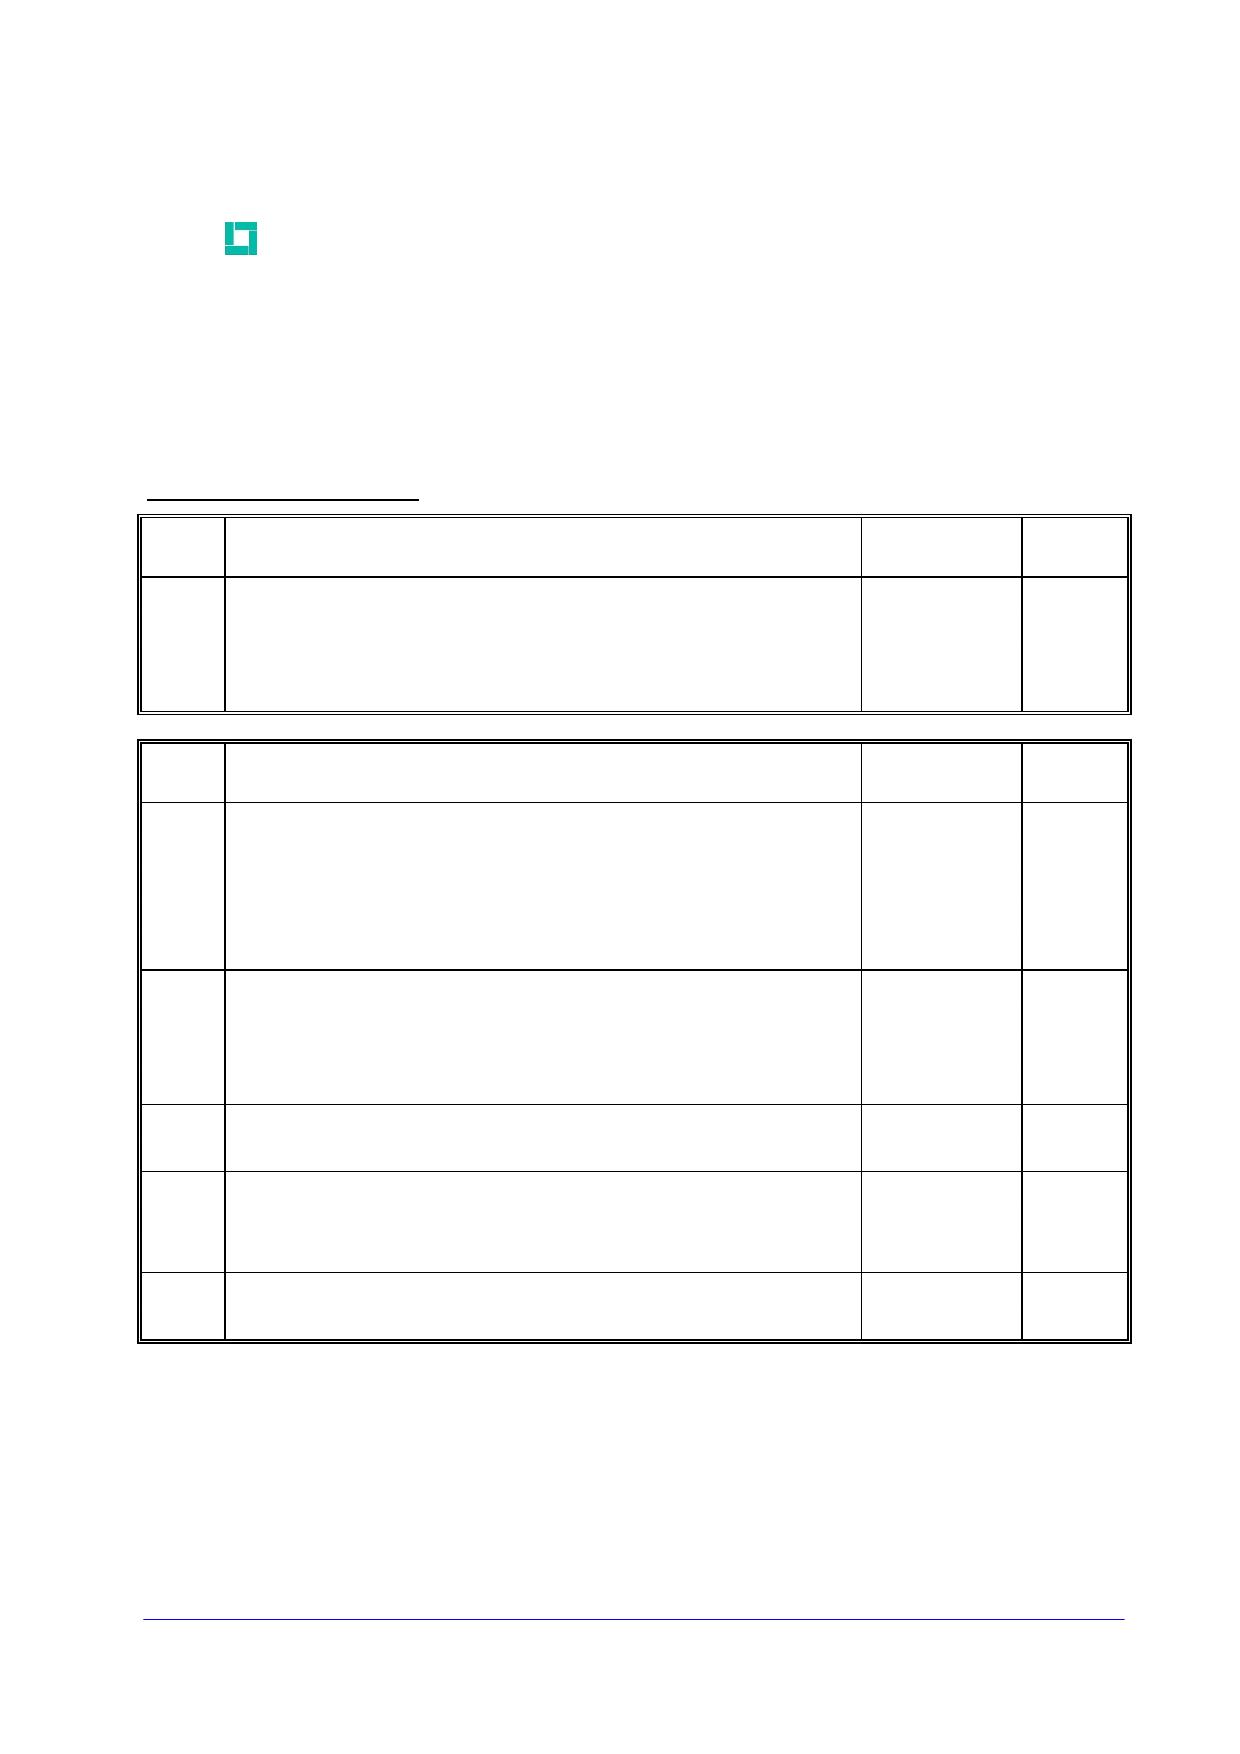 K0769NC620 Datasheet